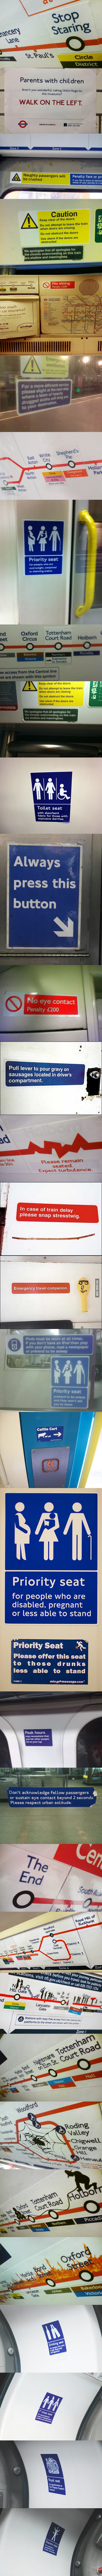 Some genius made fake London Underground signs